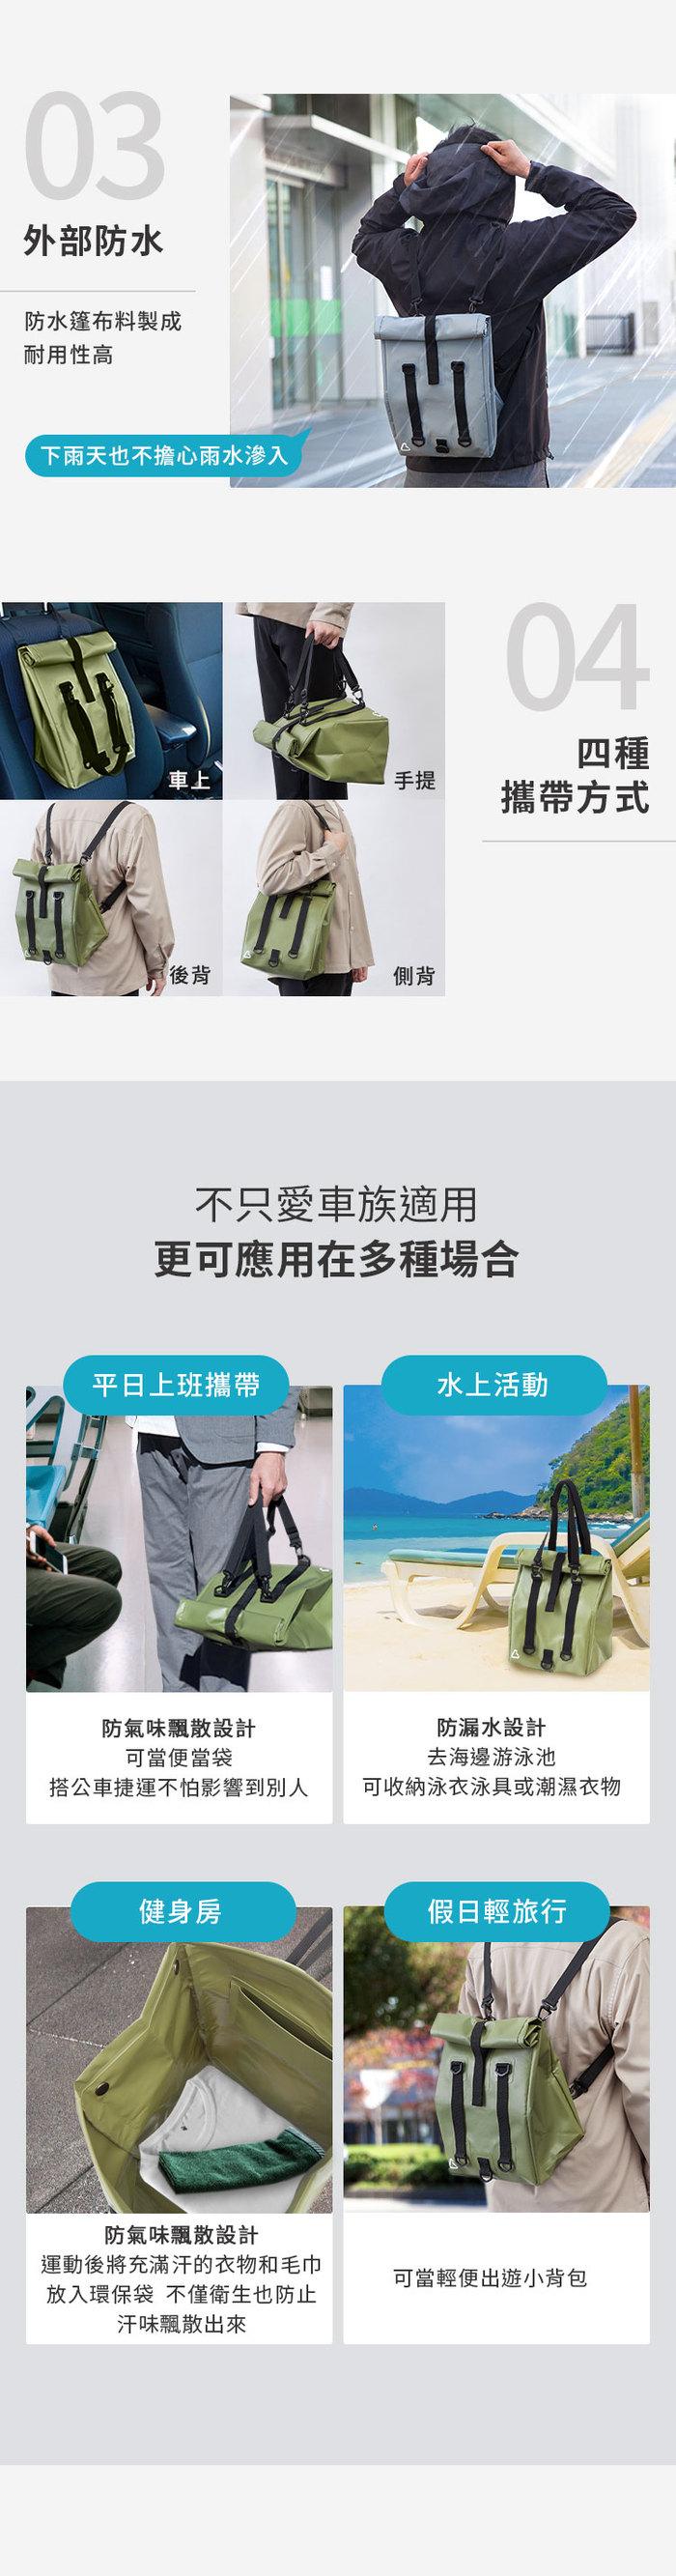 Solcion 防水食物袋 - 綠色